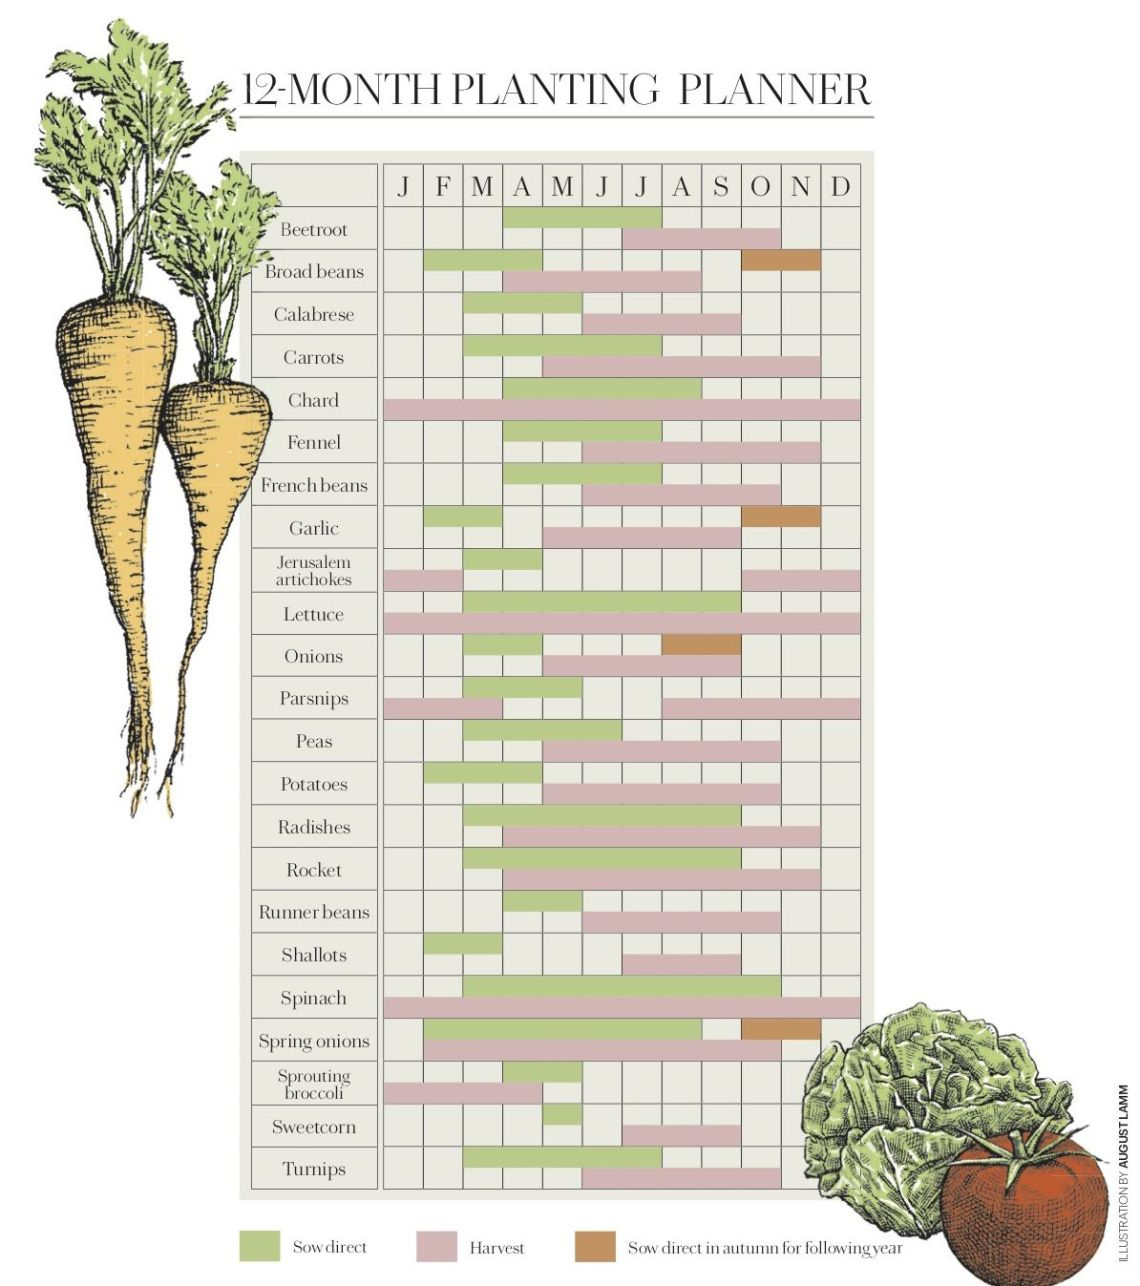 12 Month Vegetable Planting Calendar When To Plant Vegetables